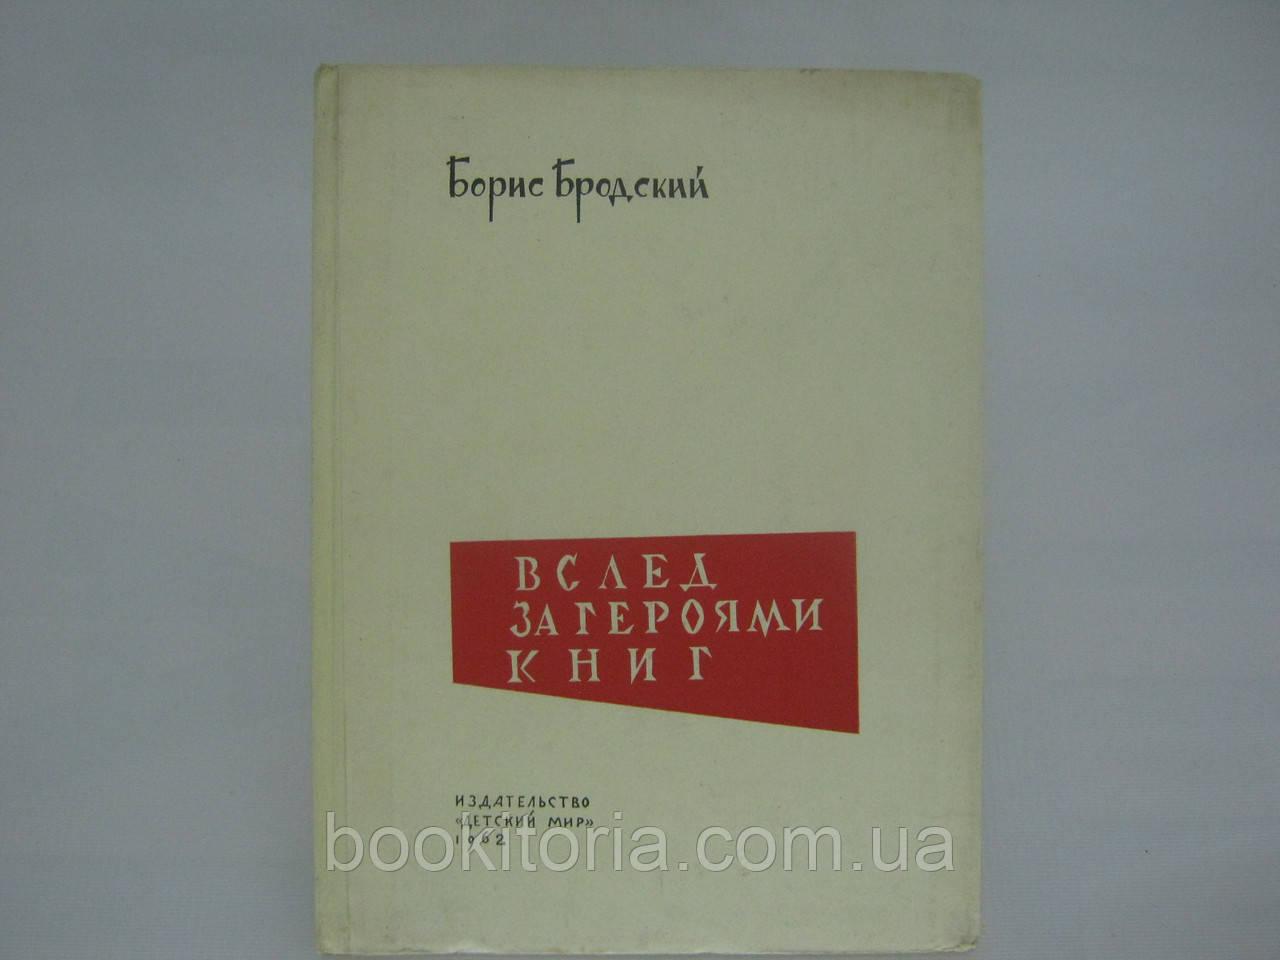 Бродский Б. Вслед за героями книг (б/у).